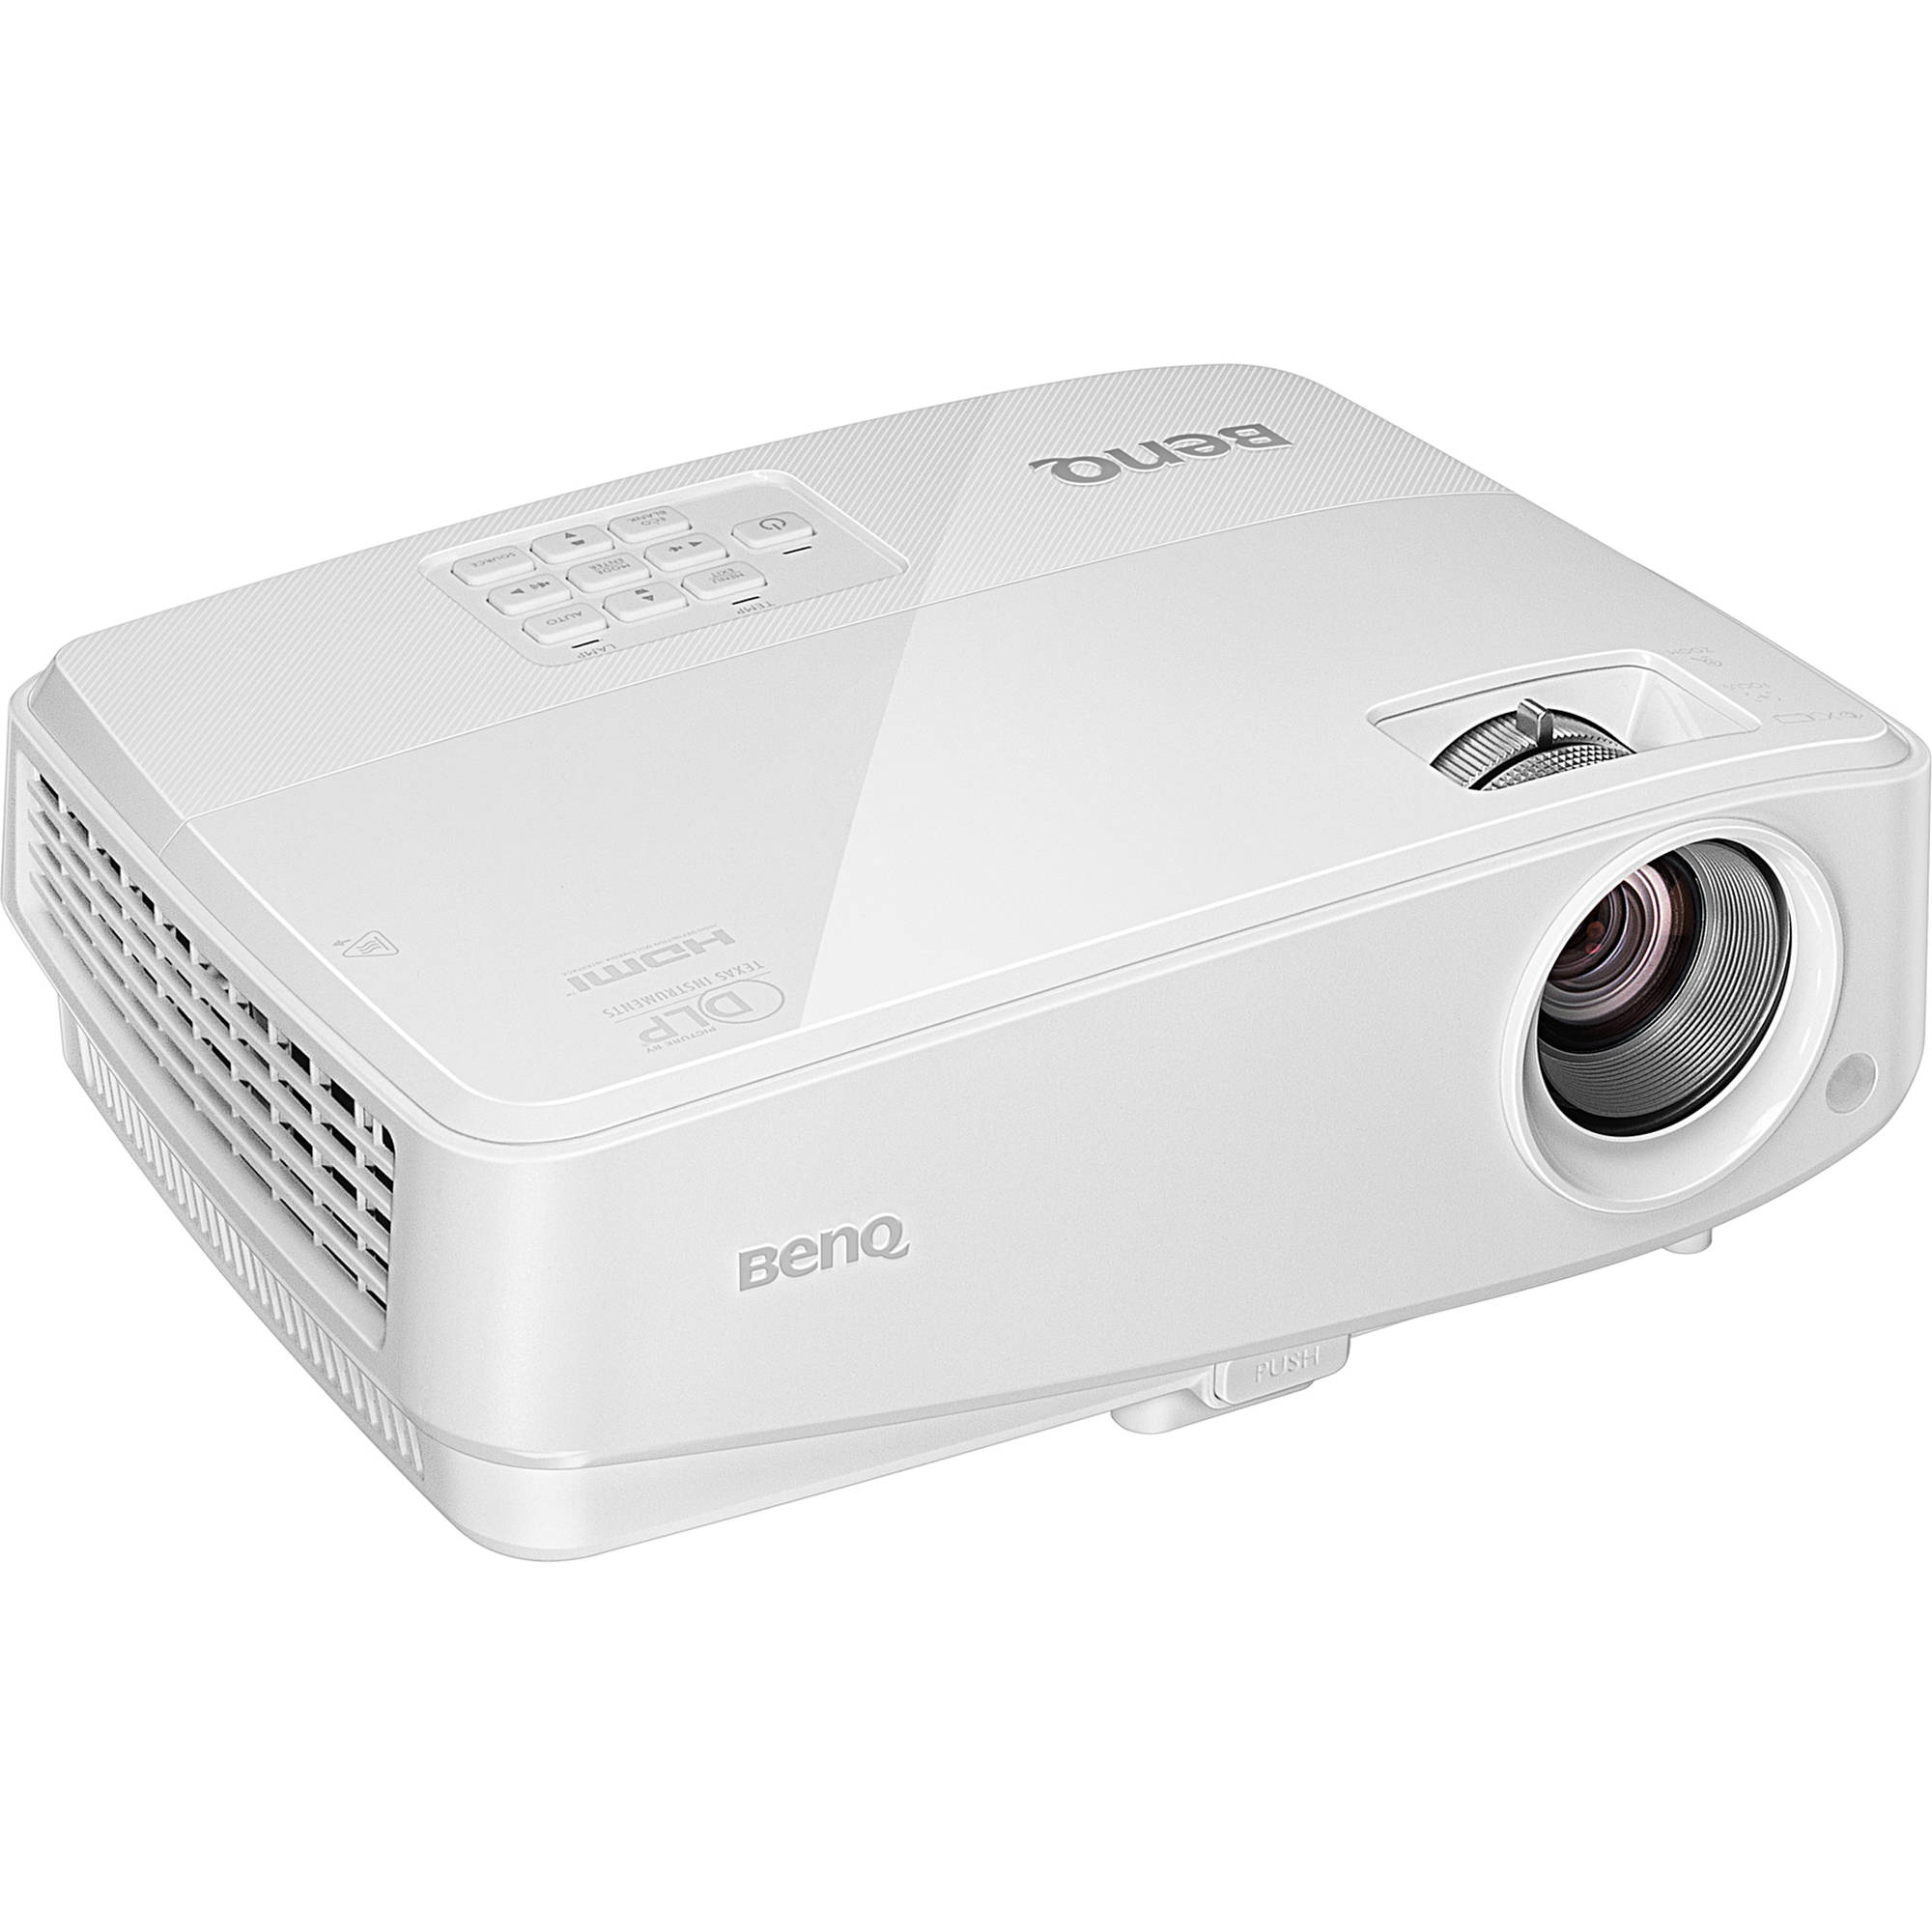 Benq Dlp Business Projector Wxga Display 3300 Lumens Dual Ms 506p Svga